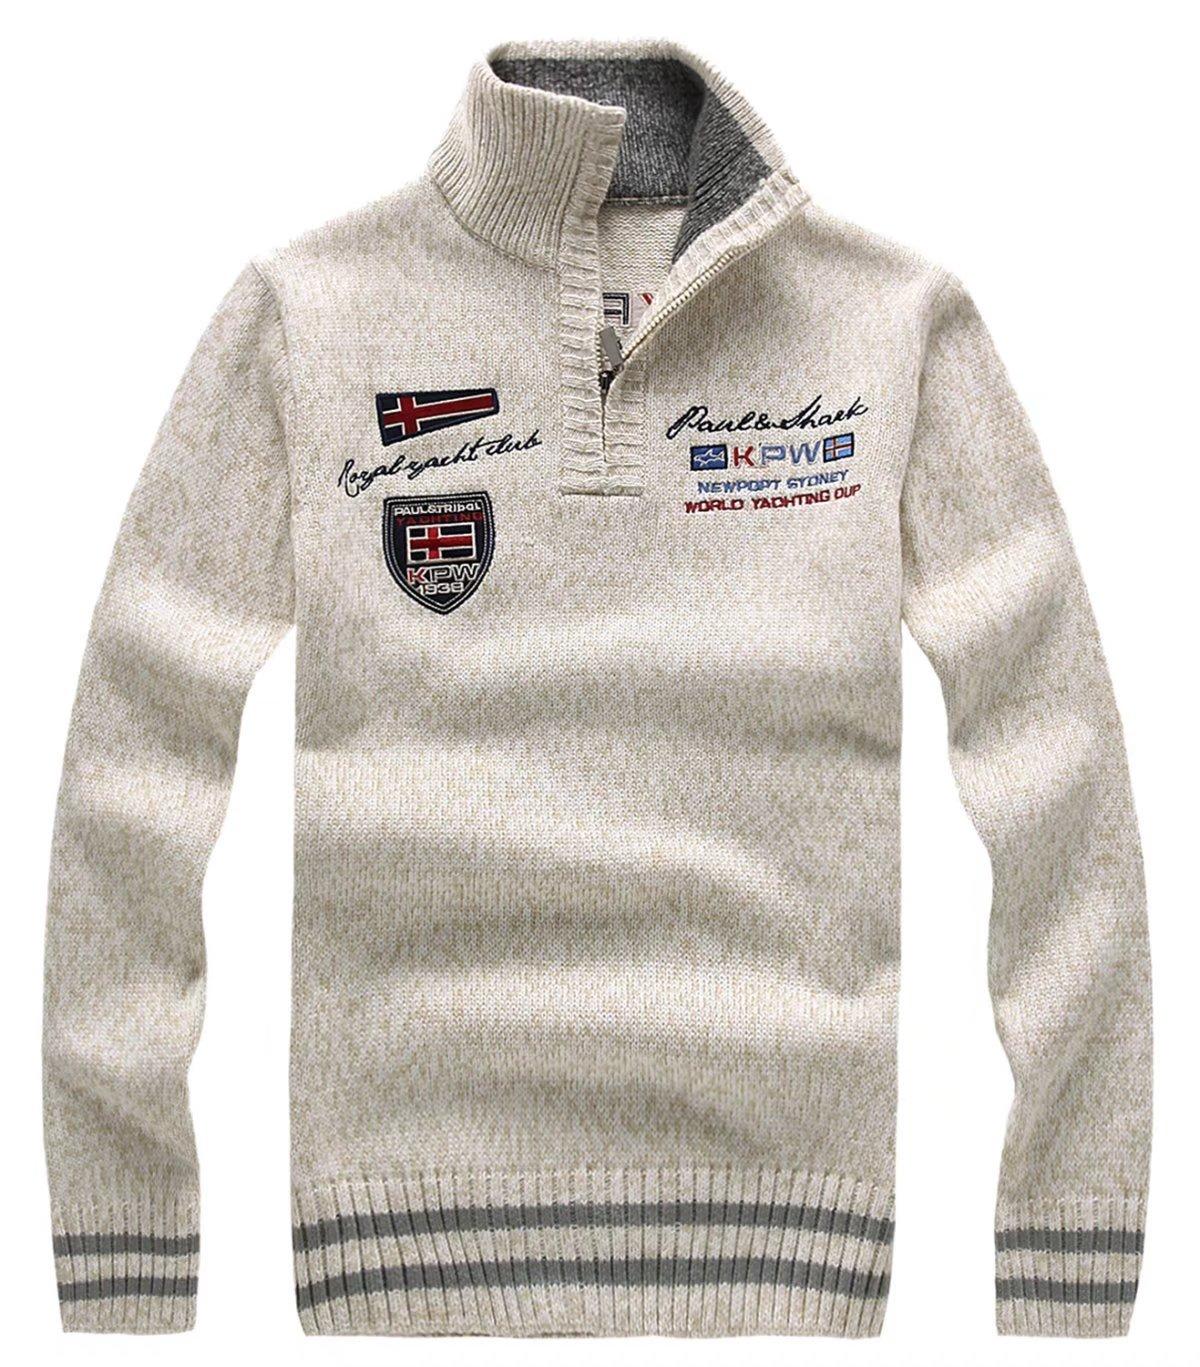 EMAOR Mens Casual 1/4 Zipper Knit Pullover Sweater